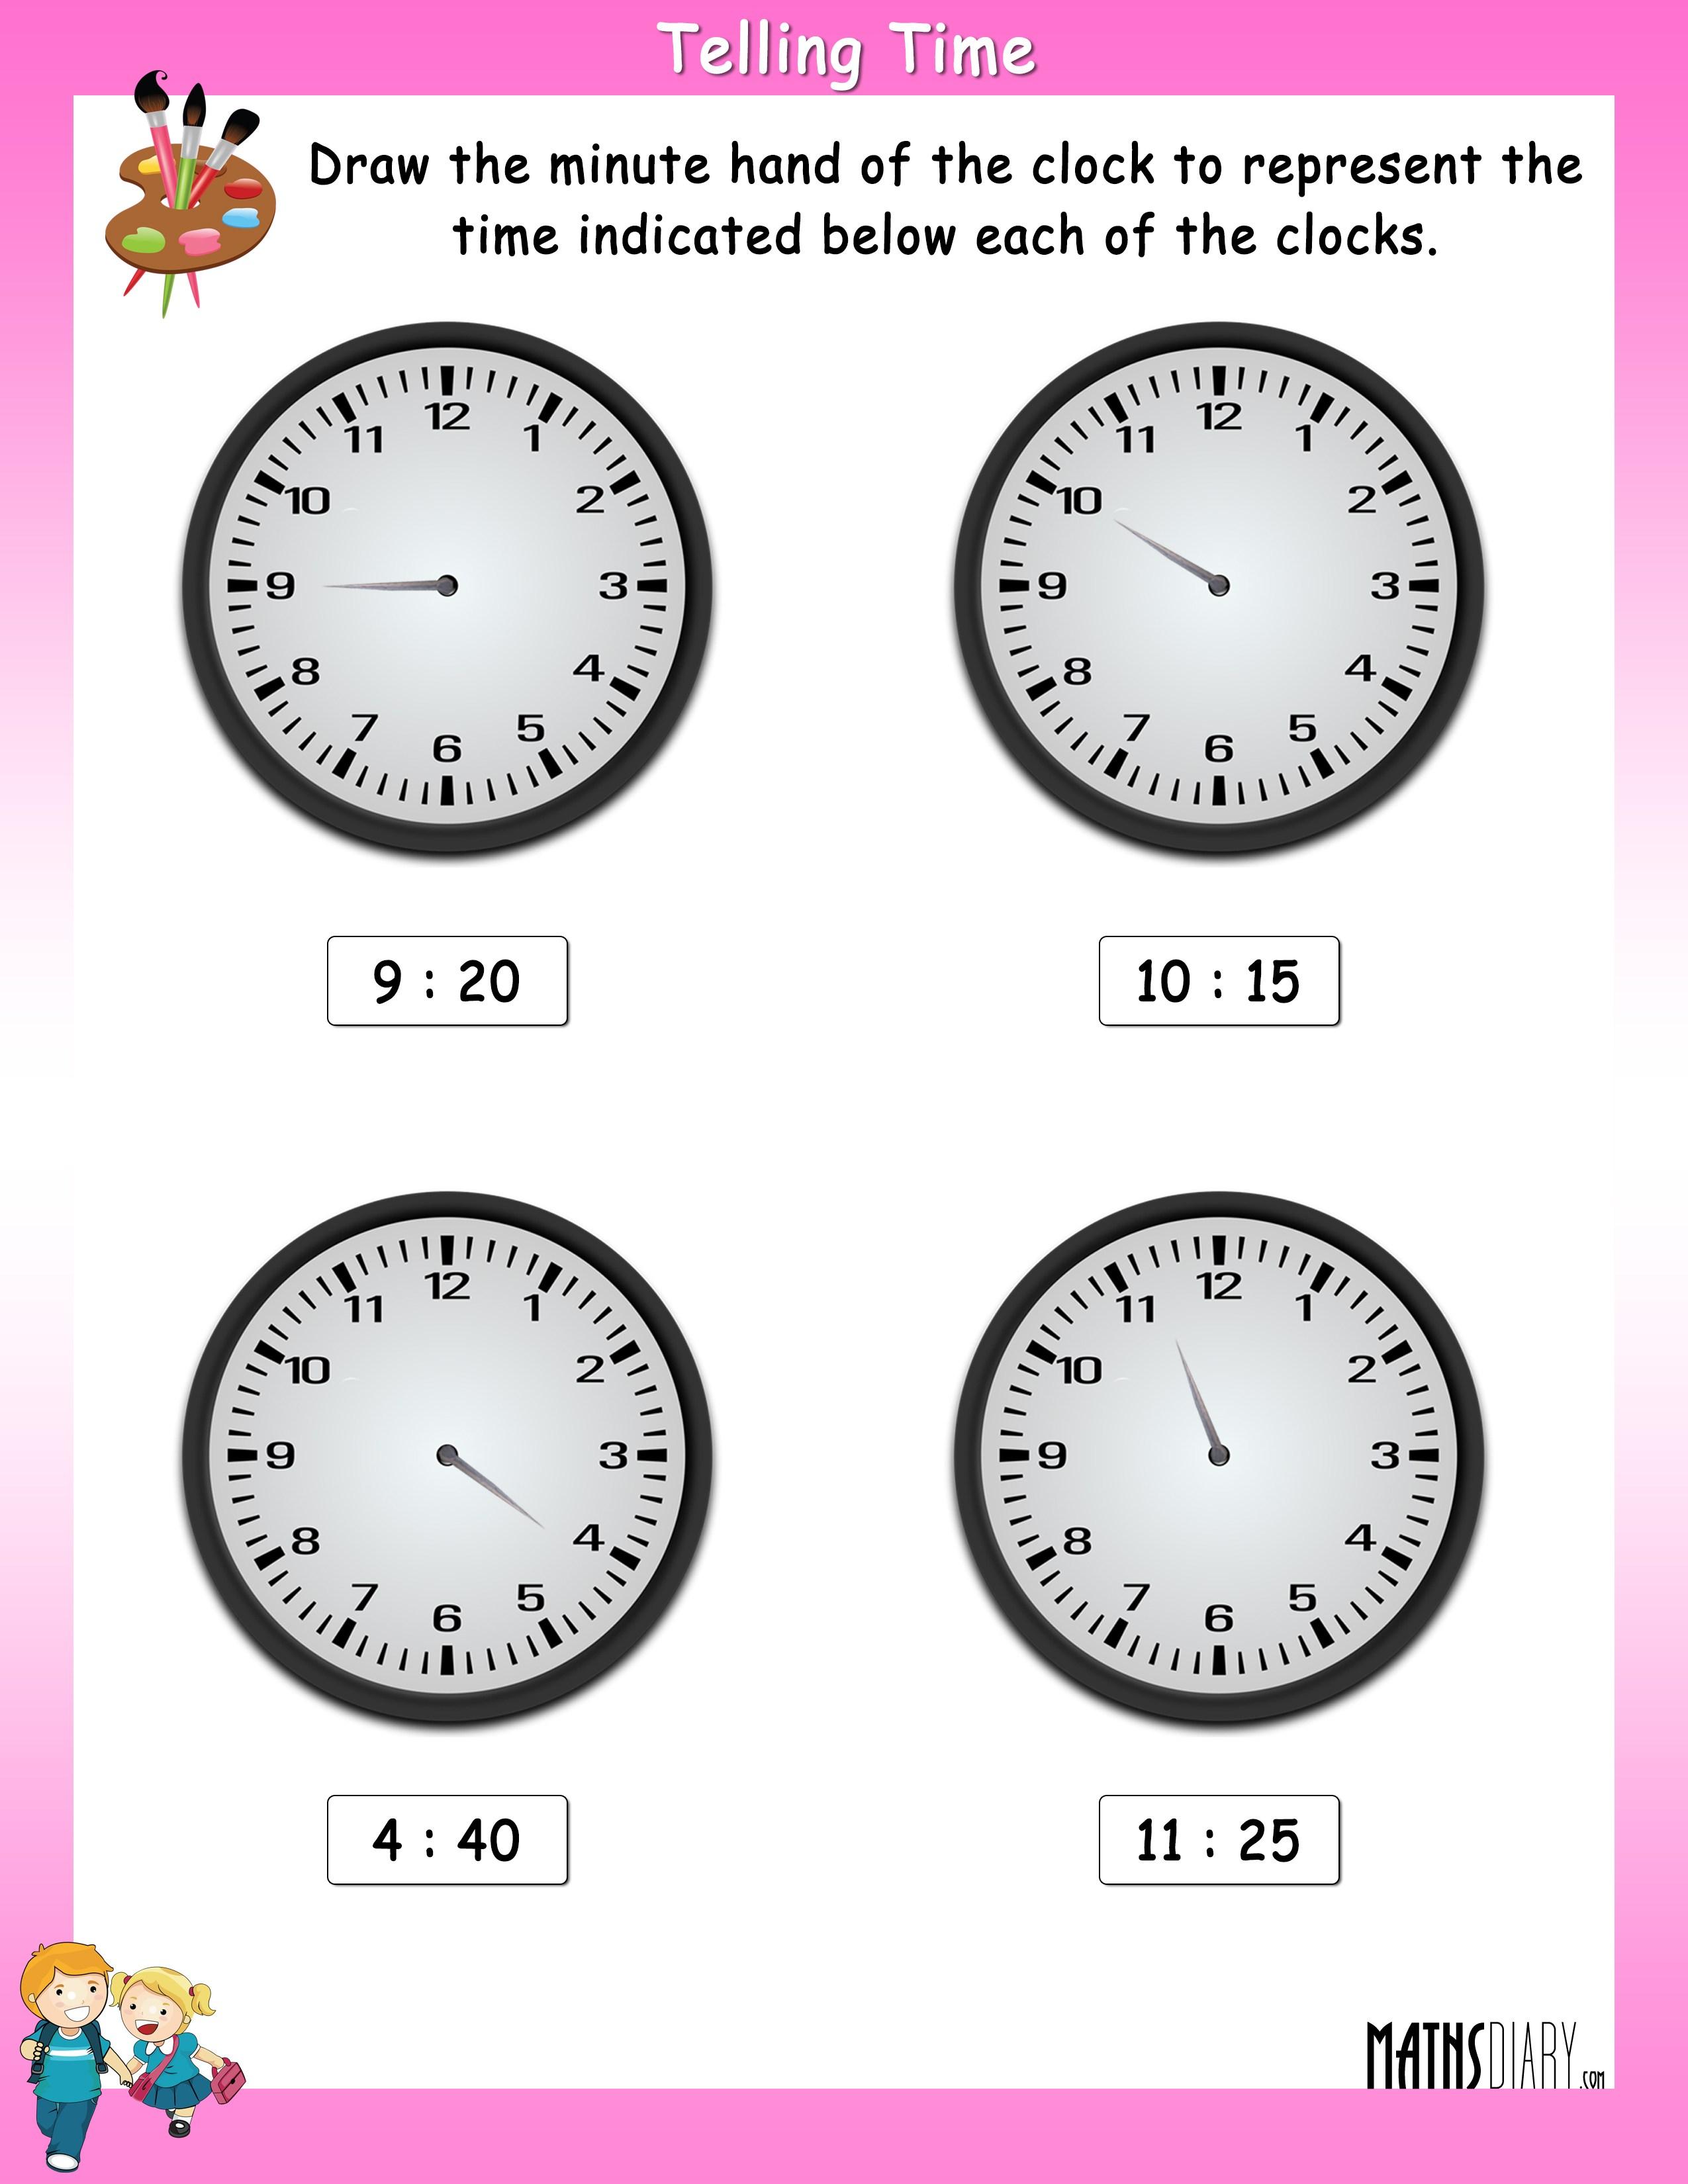 Worksheet Math Wizard Worksheets maths worksheet wizard subtraction math minute clock hands worksheets vintage face template time